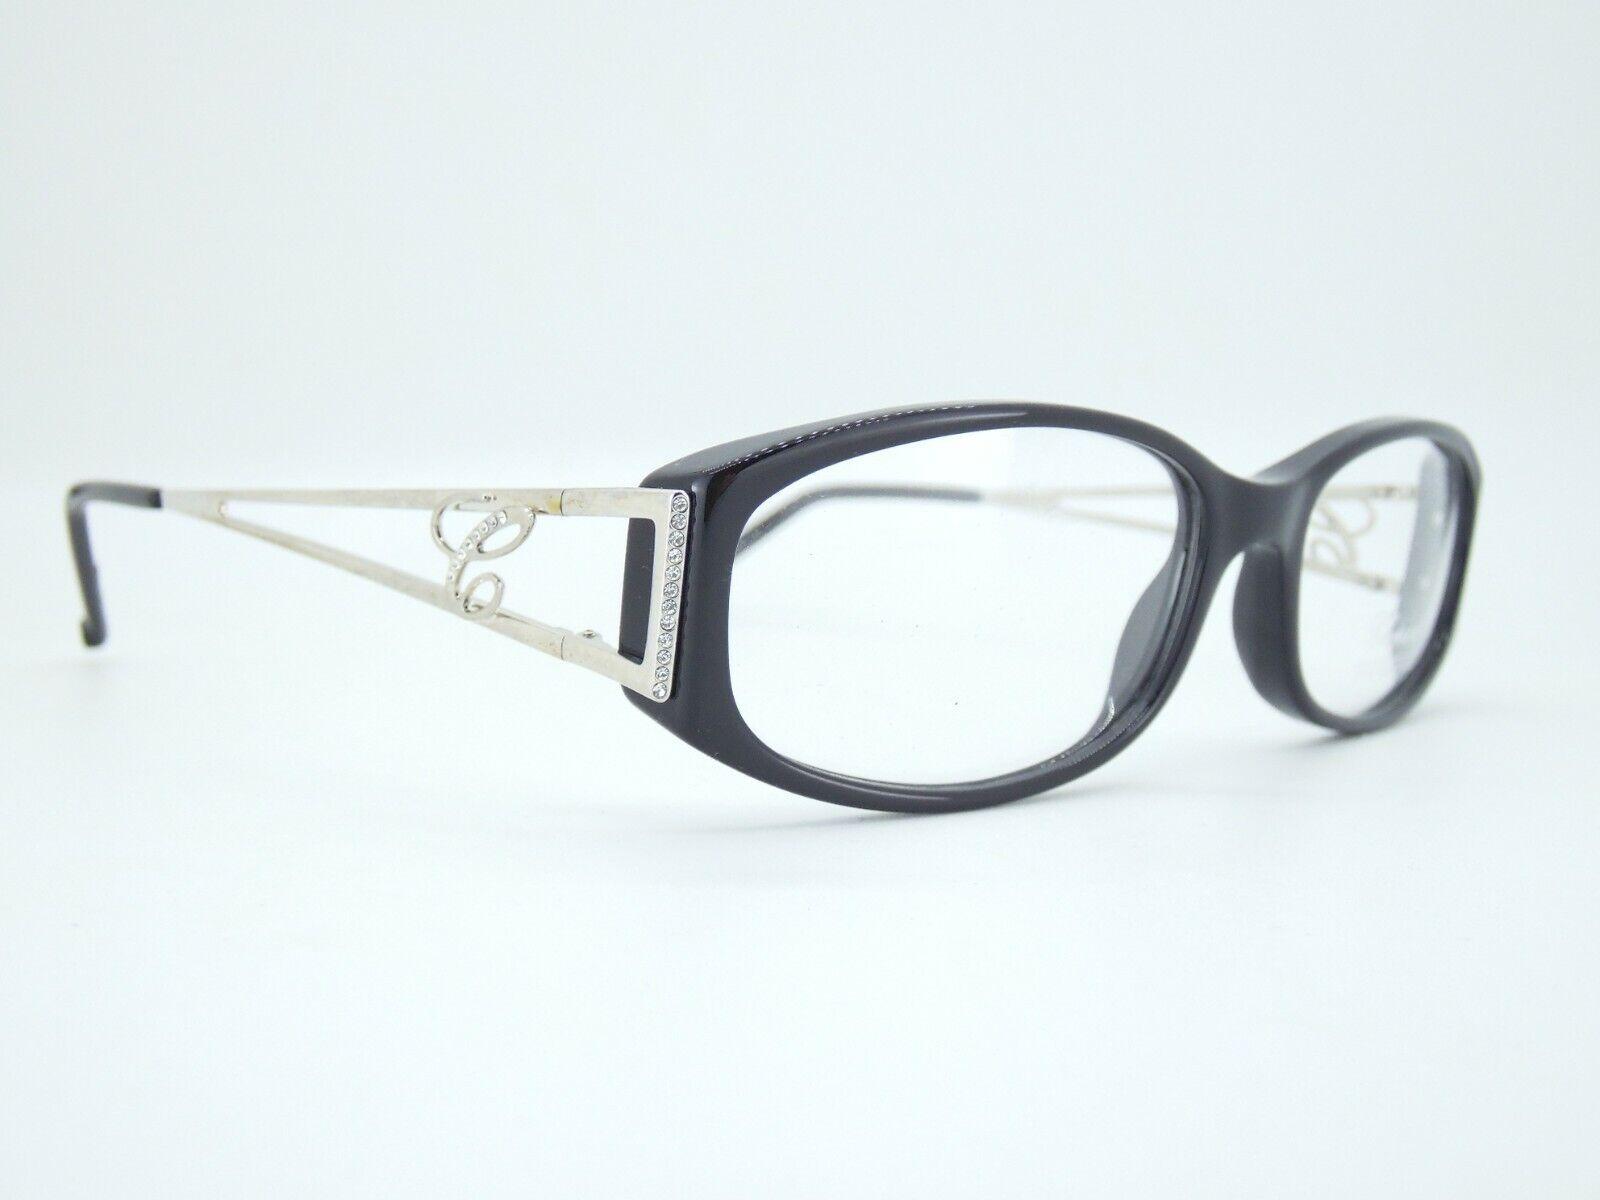 CHOPARD VCH025S 23KT GP SCHWARZ Brille eyeglass frame Goggles NEU NEW